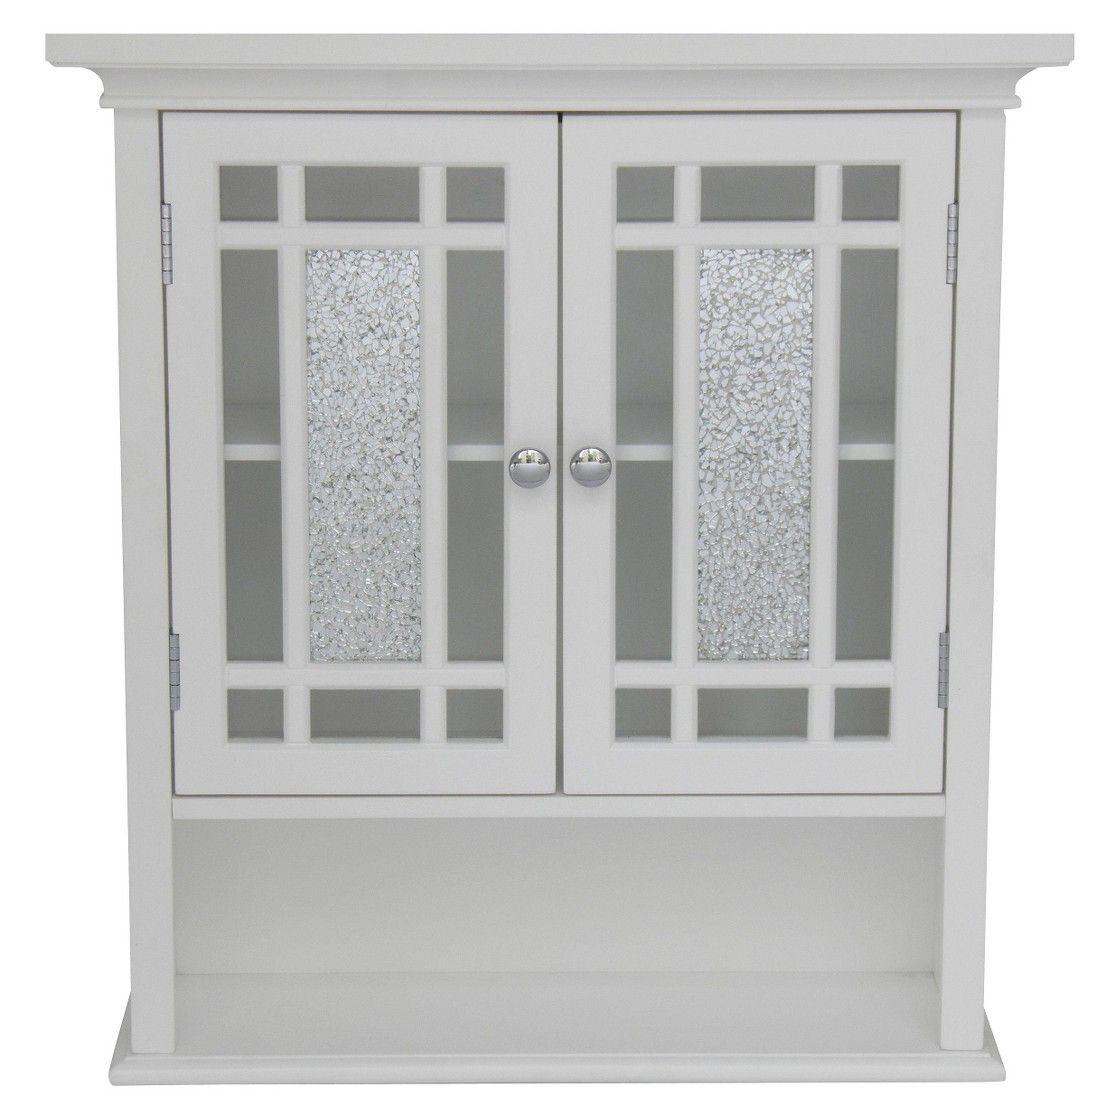 Windsor Wall Cabinet White/Espresso - Elegant Home Fashions ...